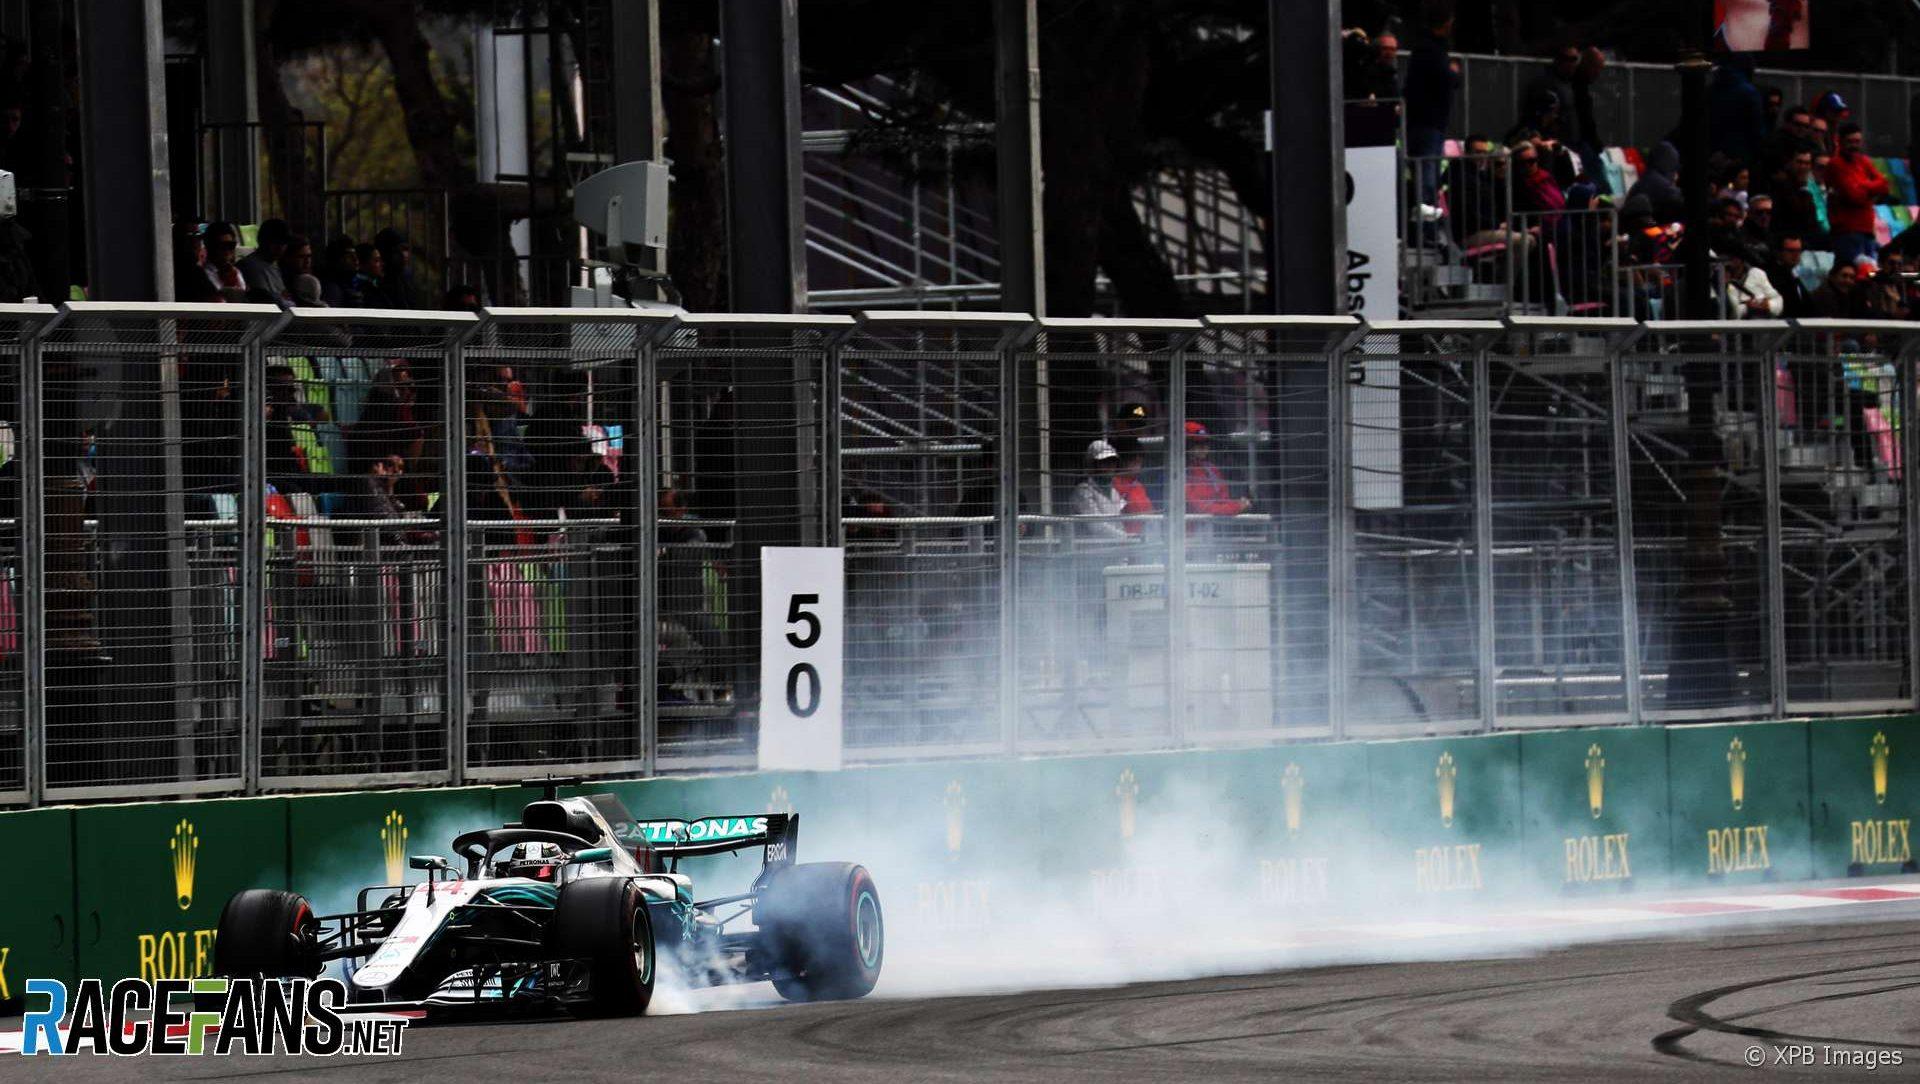 Lewis Hamilton, Mercedes, Baku City Circuit, 2018